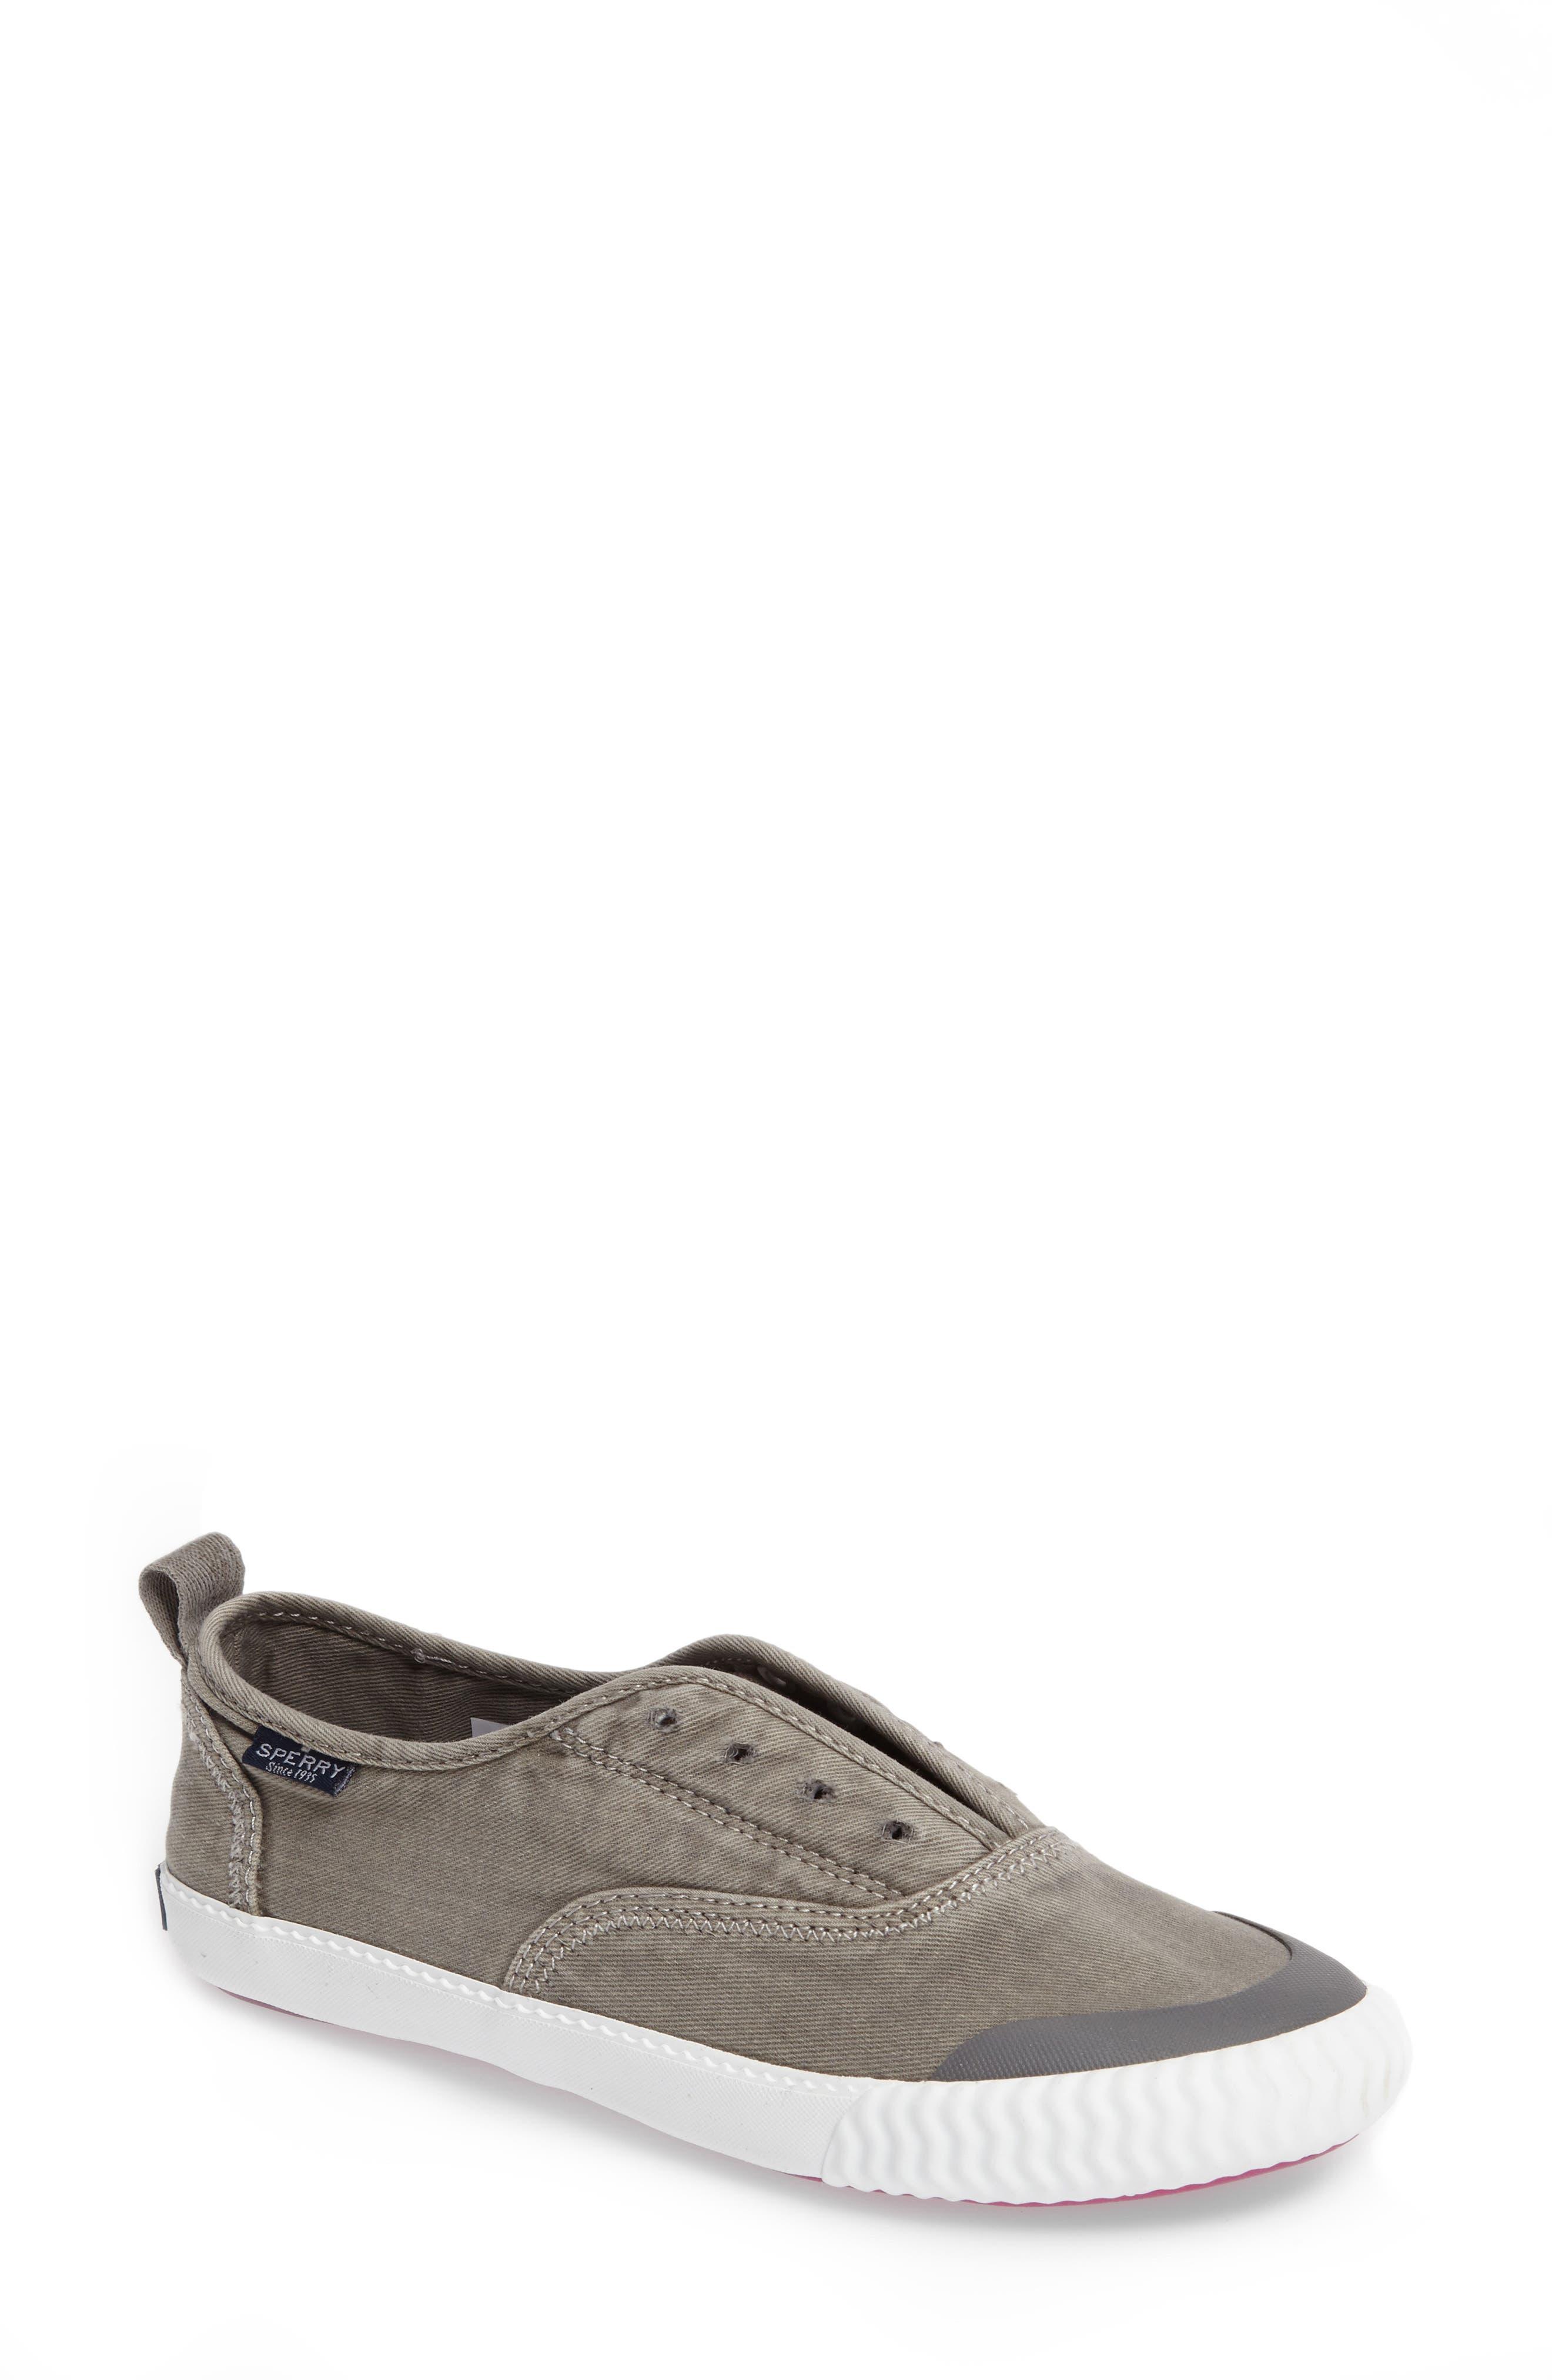 Sayel Slip-On Sneaker,                         Main,                         color, GREY FABRIC